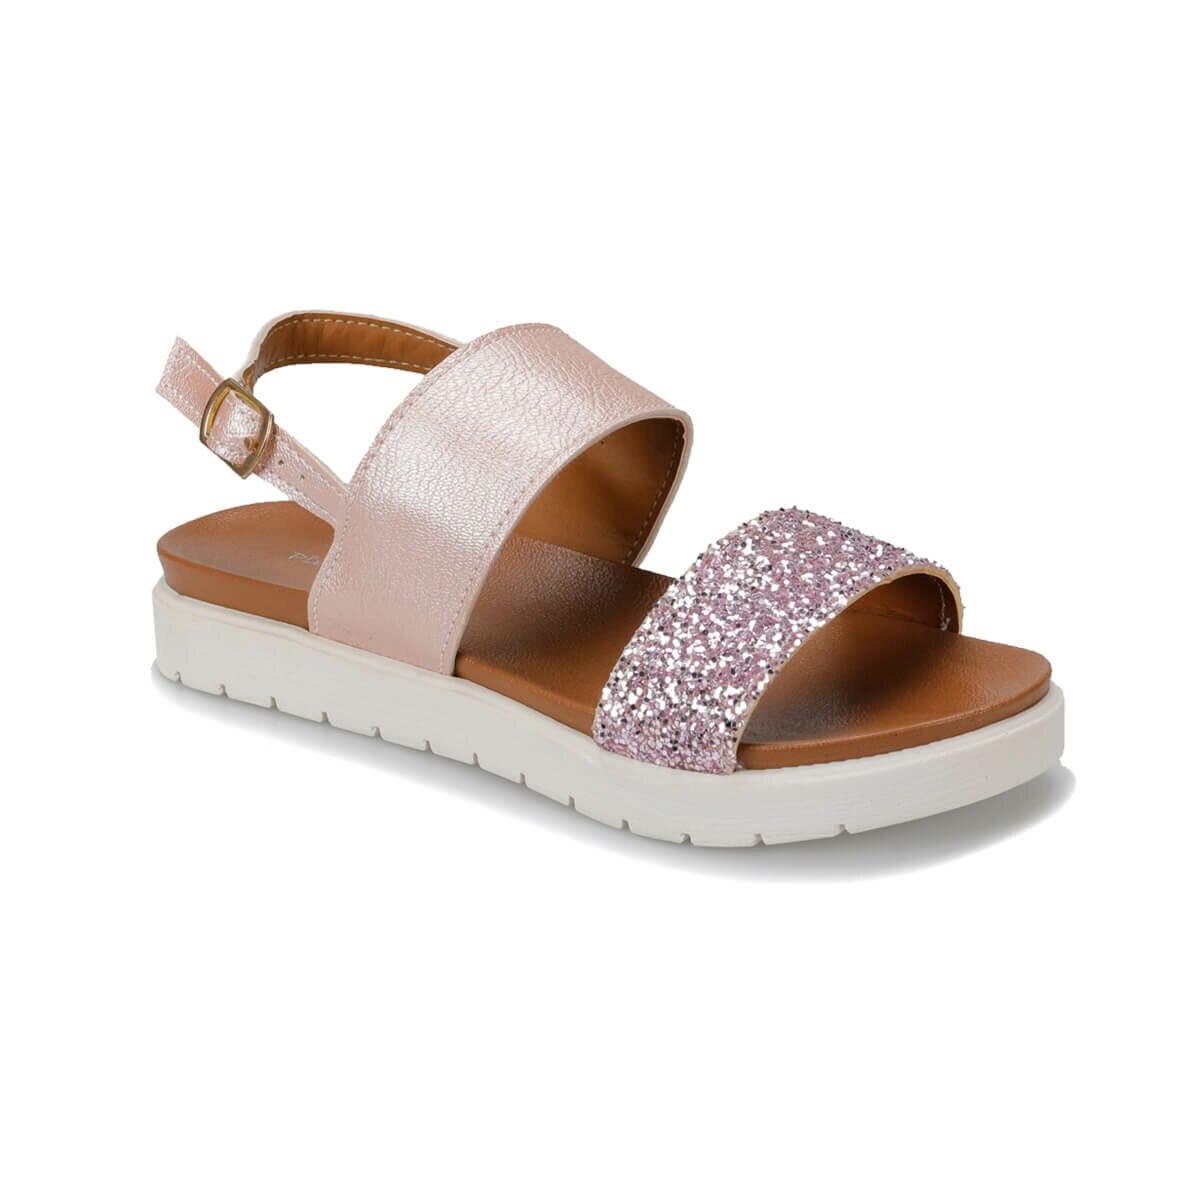 FLO 91. TITI-2. F Pink Female Child Sandals PINKSTEP